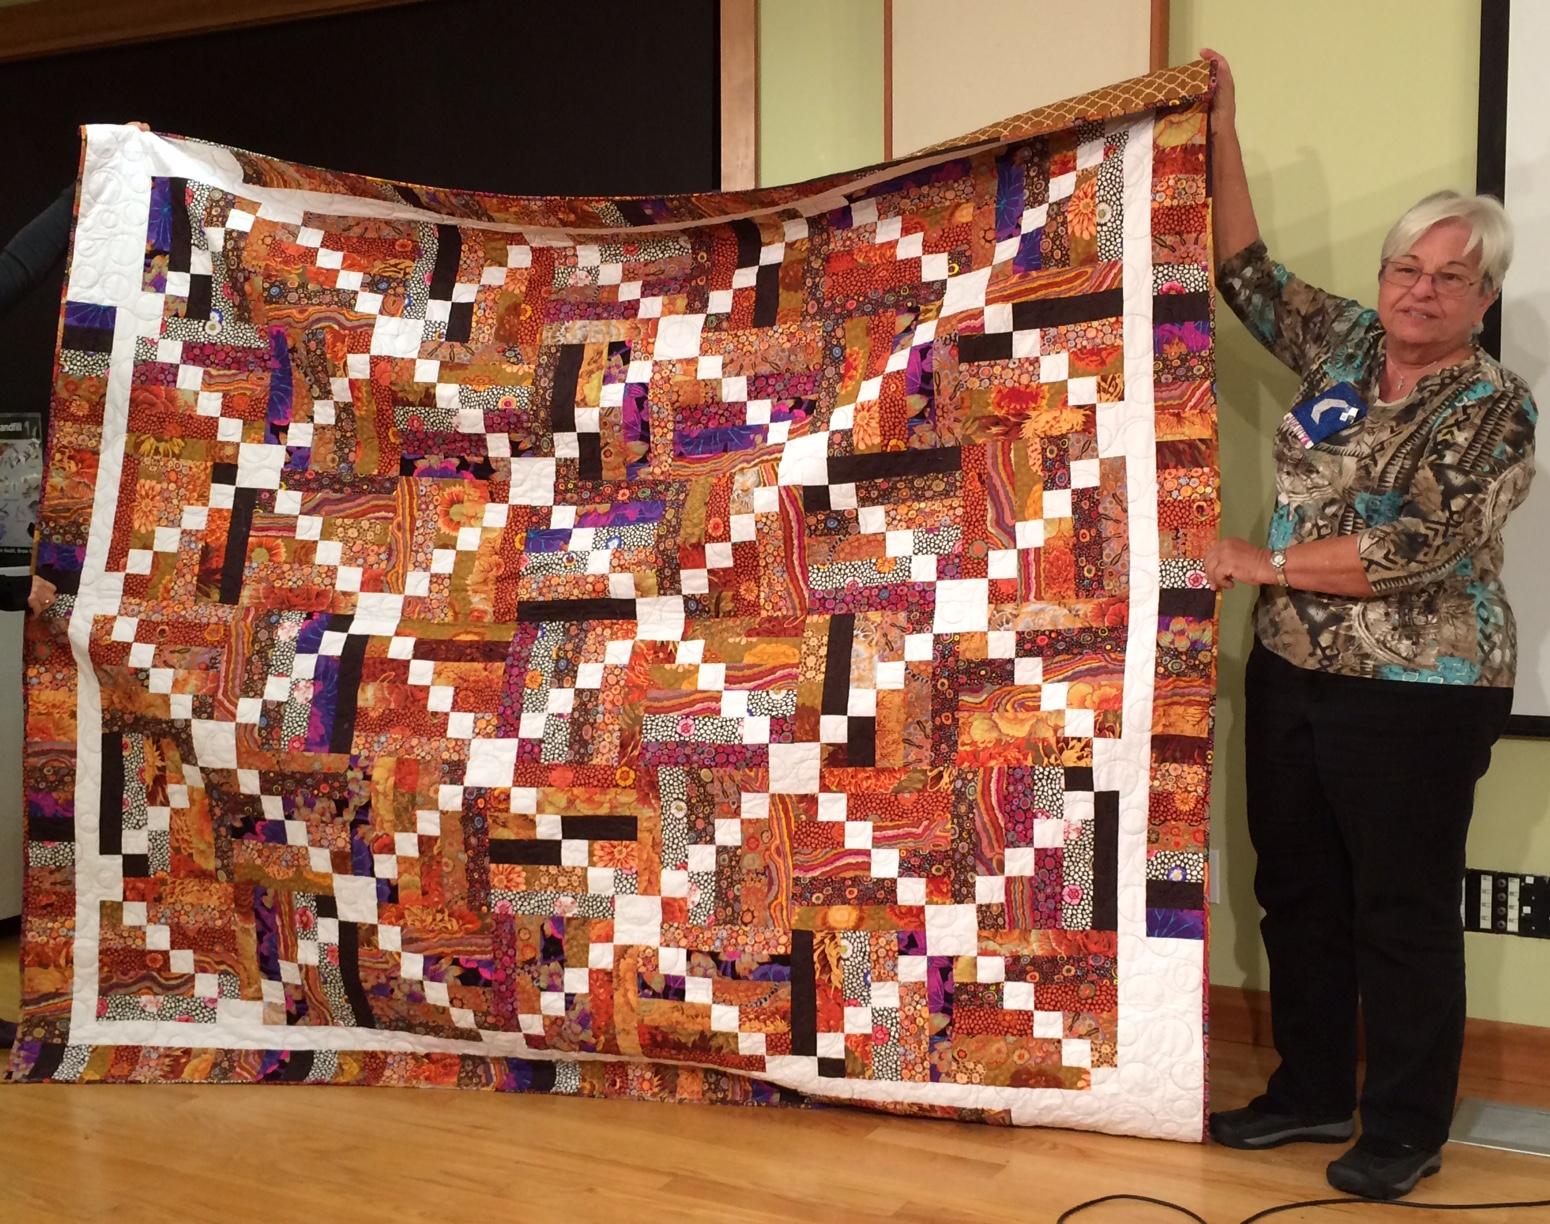 Juanita C. - Sticks and Stones using Kaffe Fassett fabrics